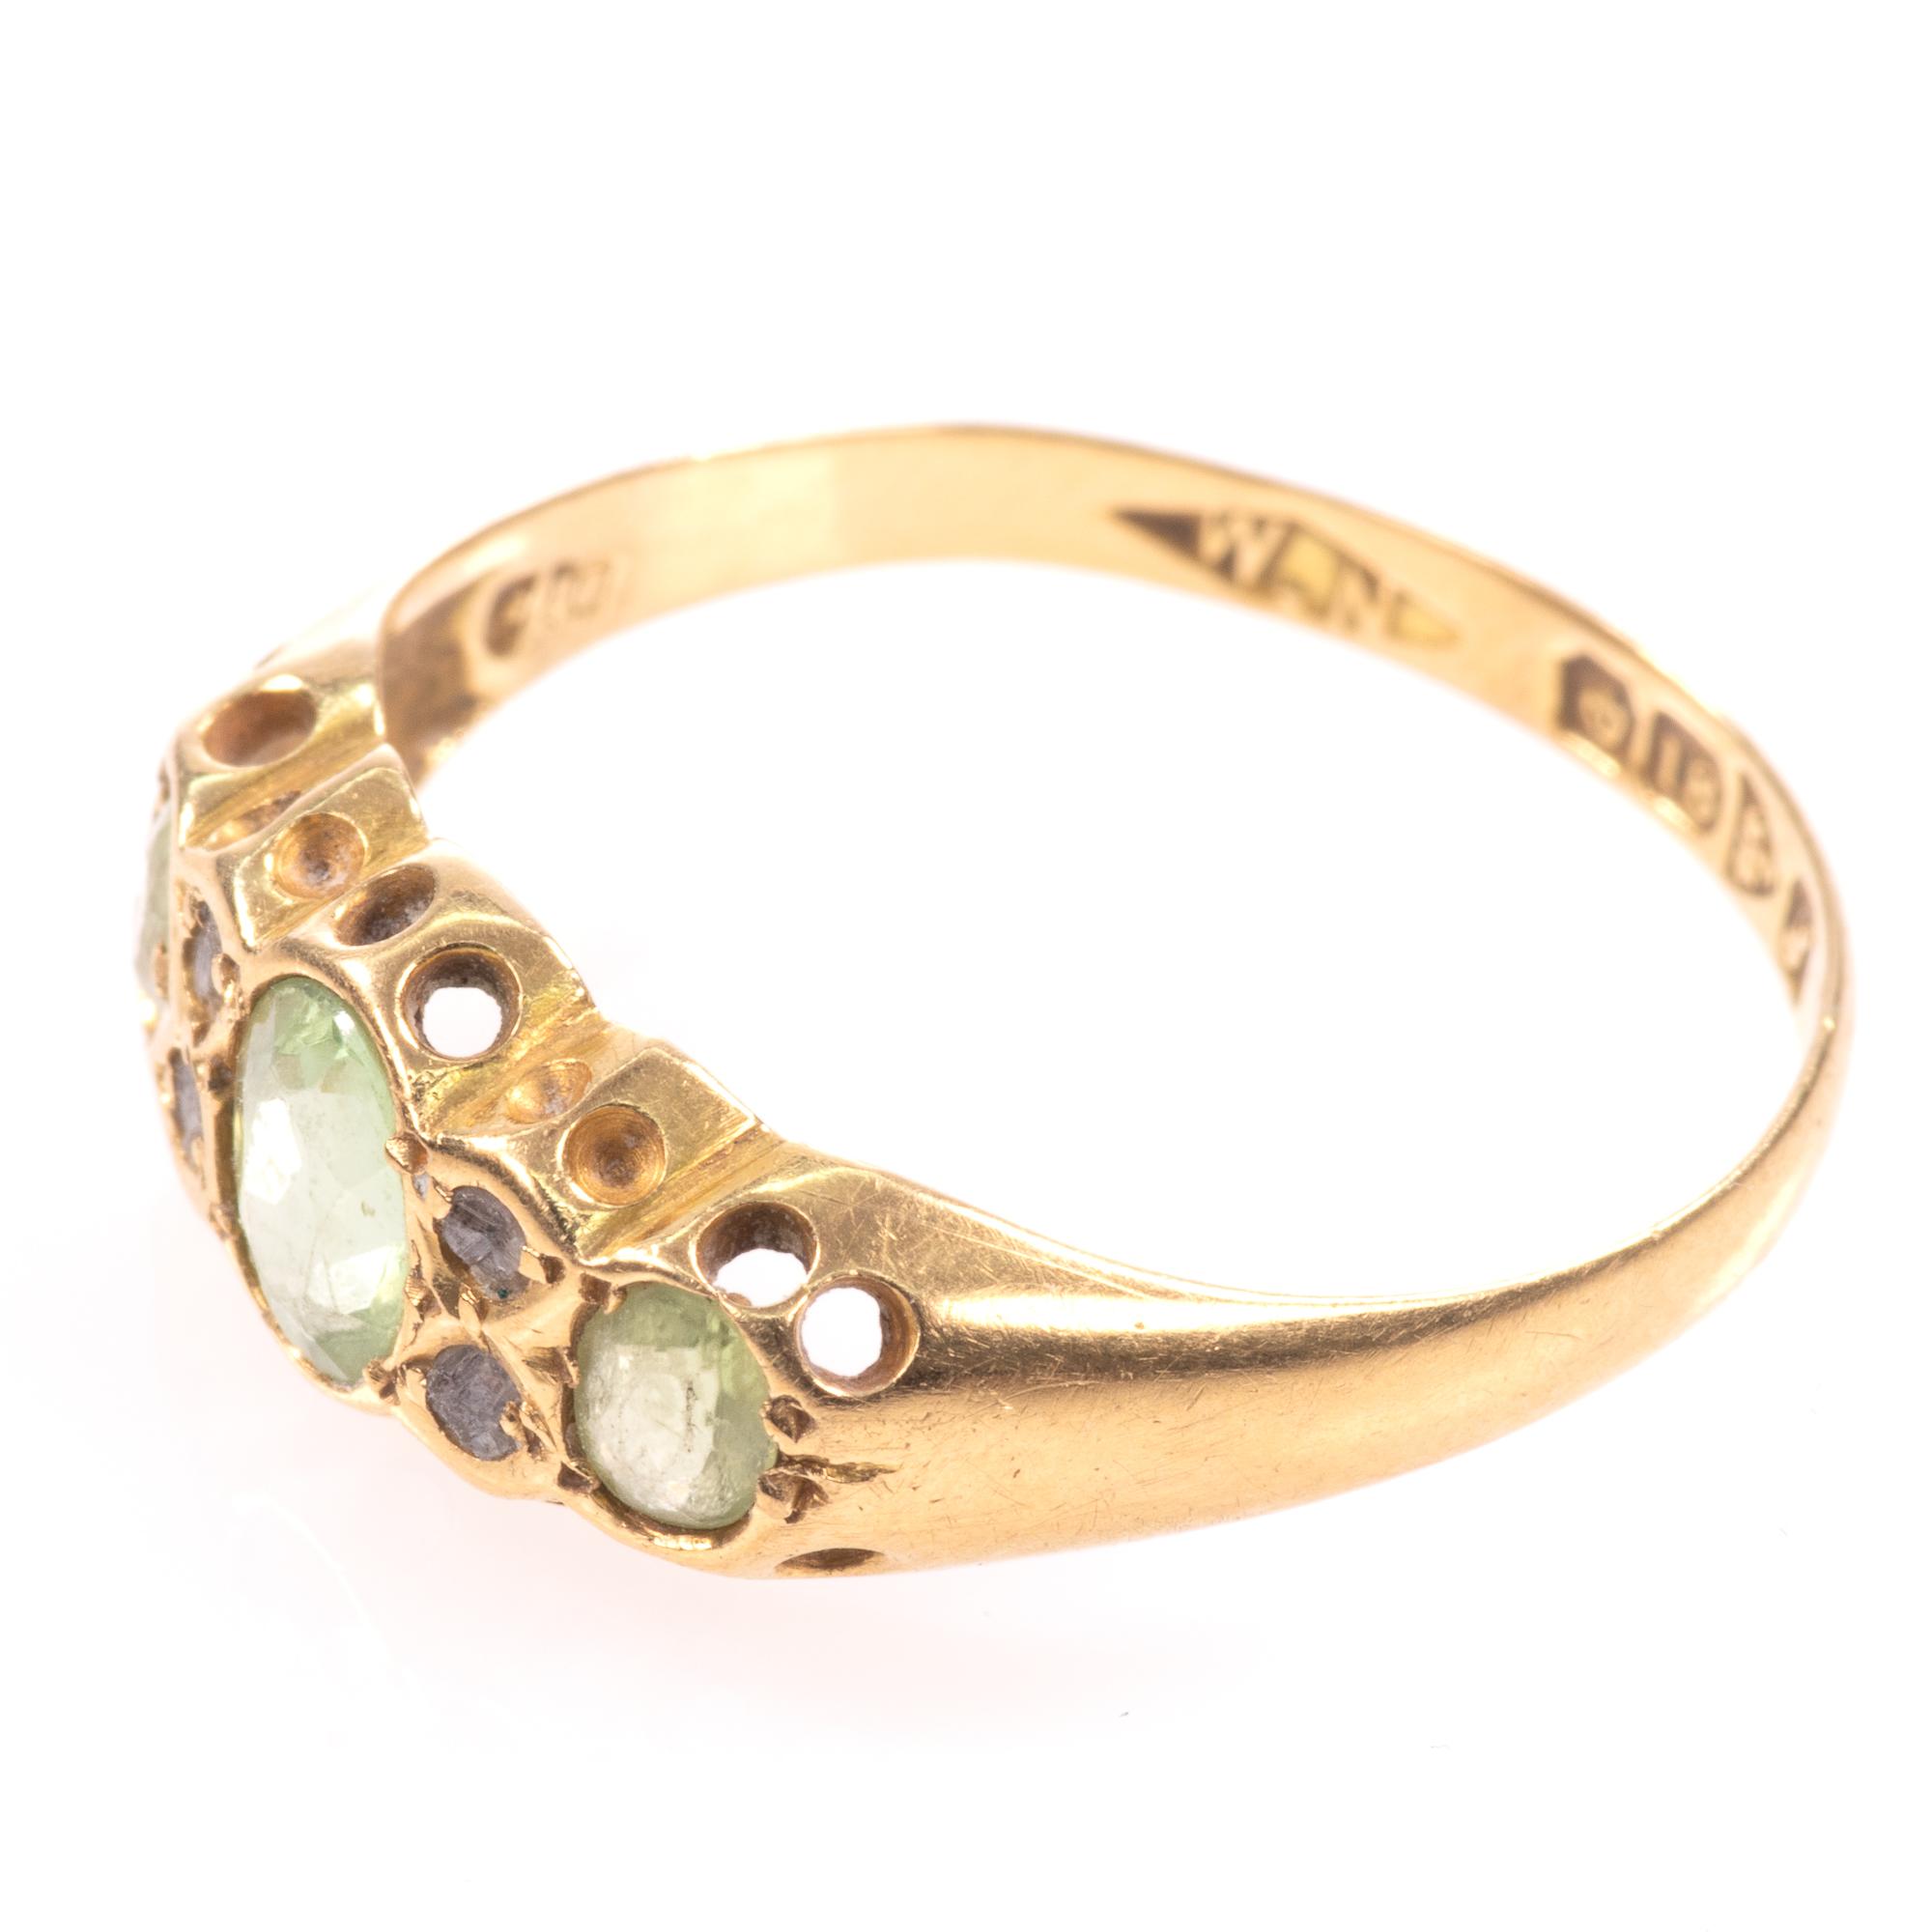 18ct Gold 0.90ct Peridot & Diamond Ring Chester 1918 - Image 6 of 8